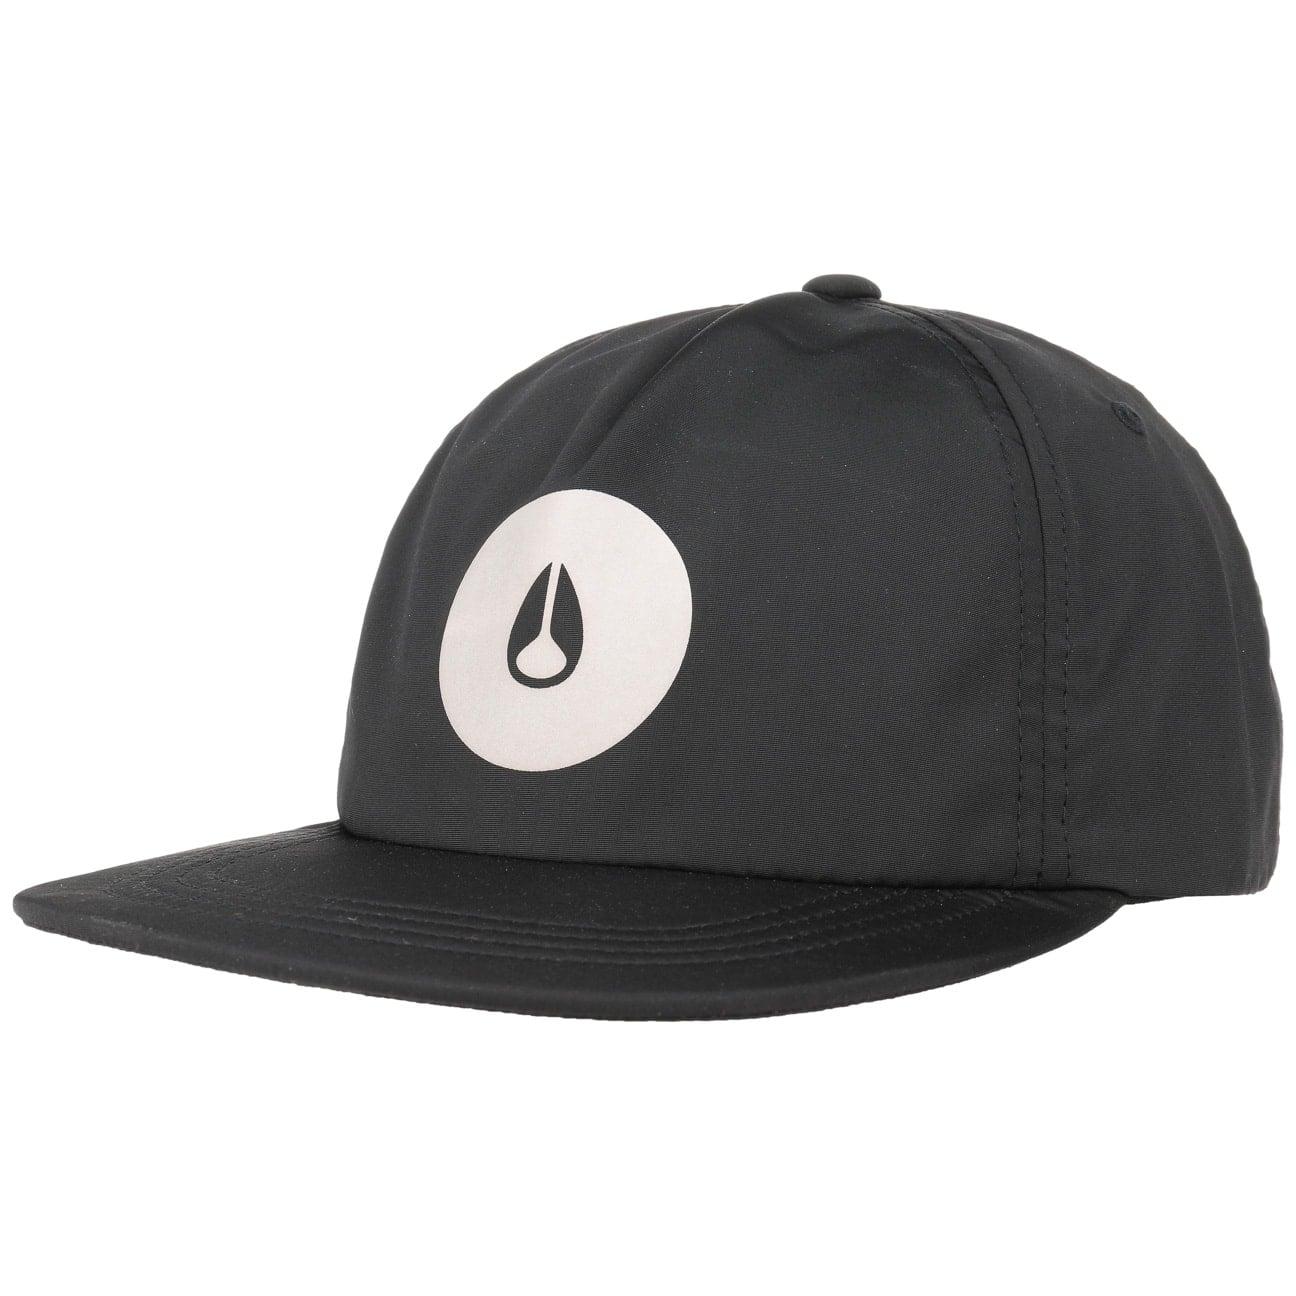 Gorra Colesy by Nixon  gorra de baseball